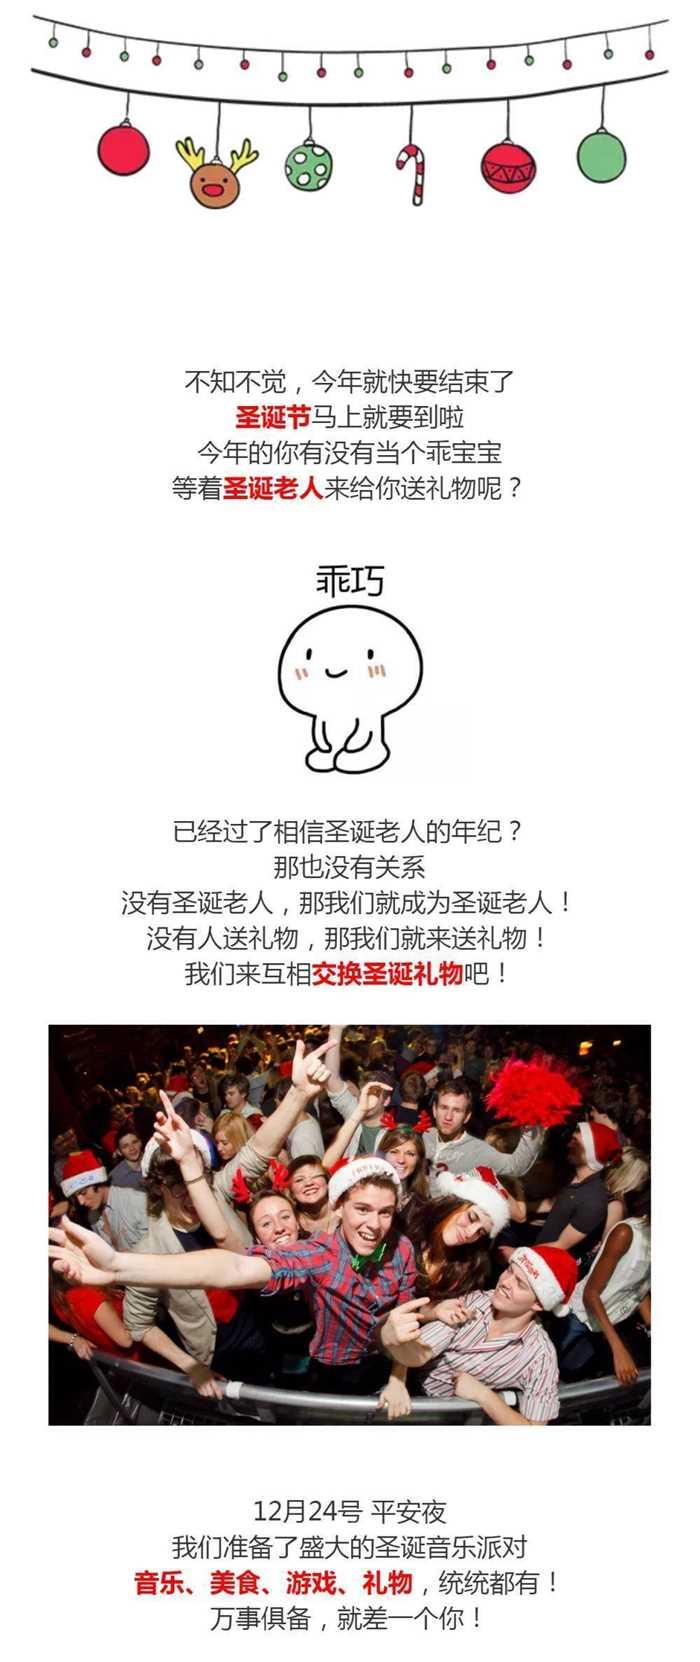 www.huodongxing.com_event_3417860329000(iPhone 6 Plus).jpg